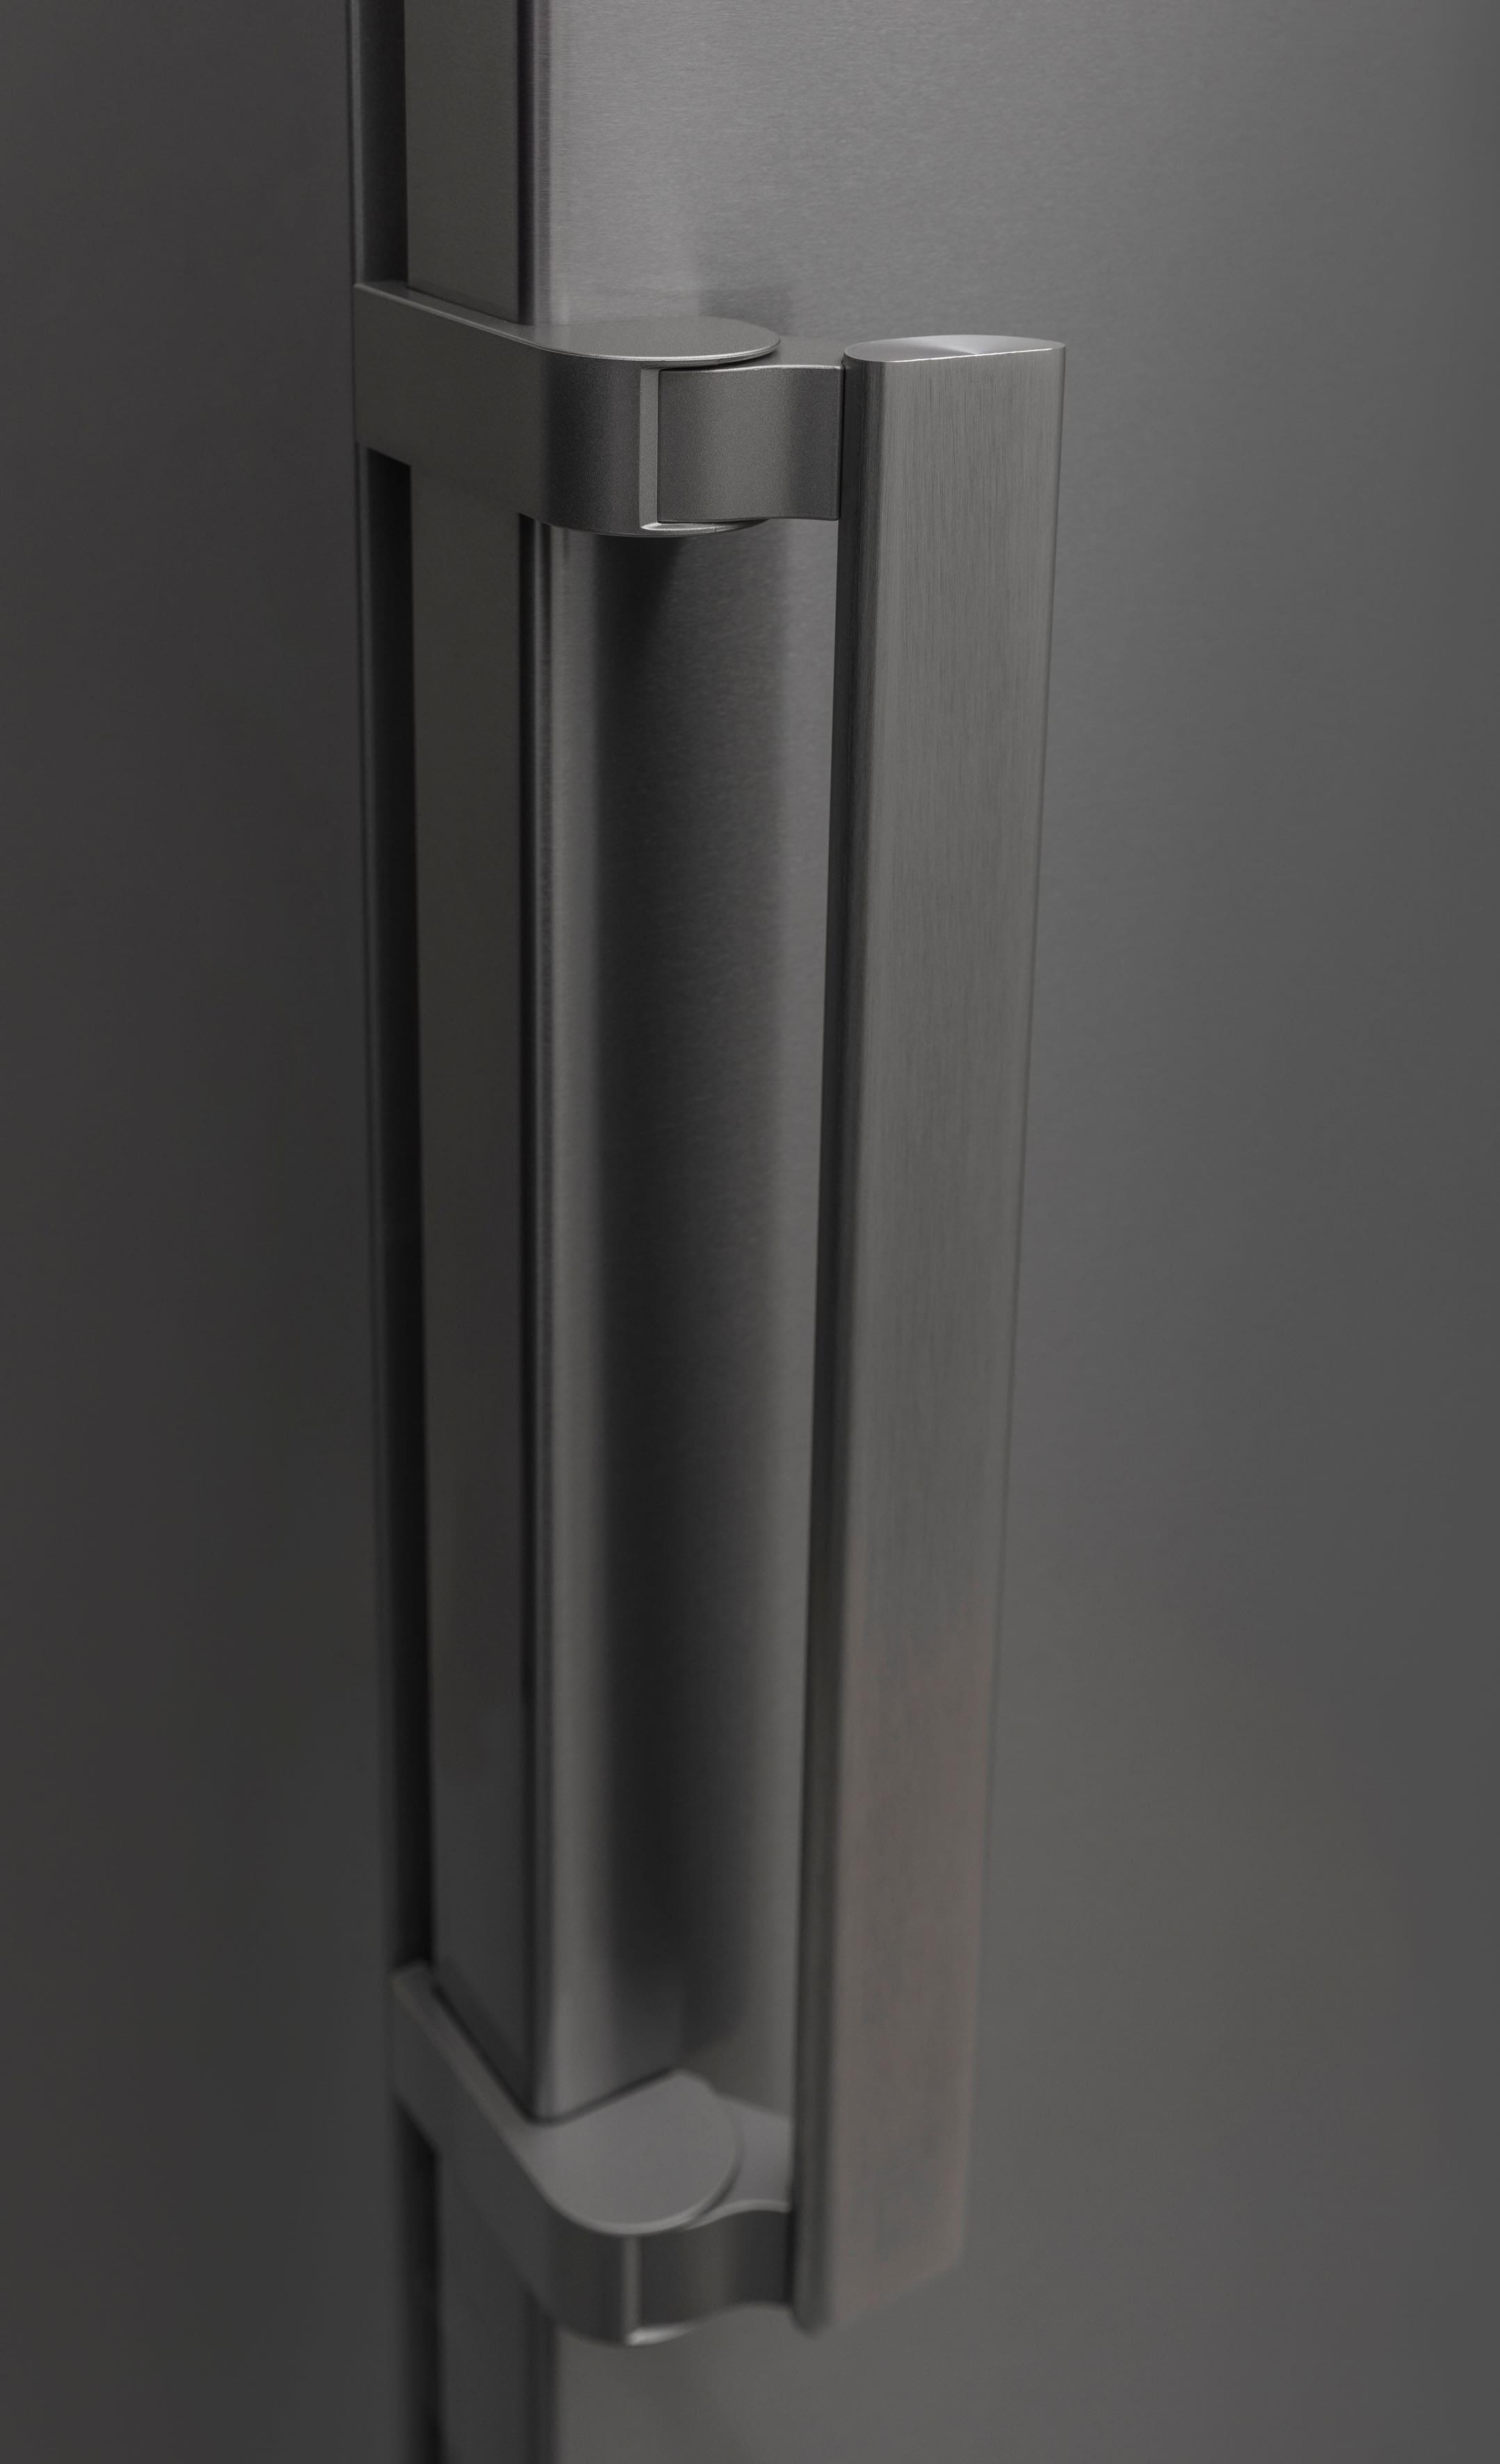 Sharp Gefrierschrank SJ-SC41CHXIE-EU, SJ-SC41CHX, 186 cm hoch, 59,5 cm breit